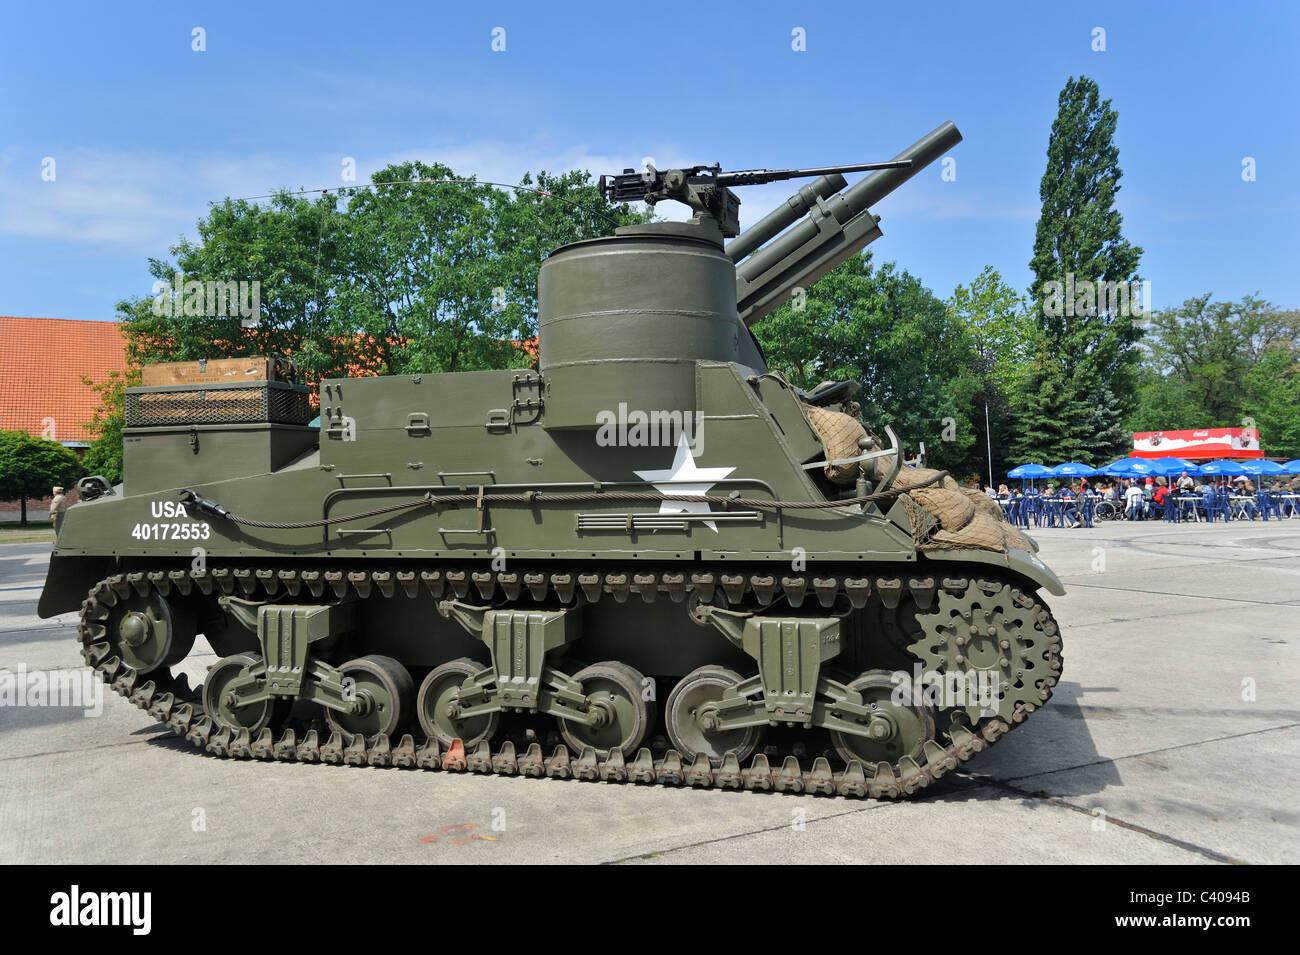 Howitzer Stock Photos & Howitzer Stock Images - Alamy